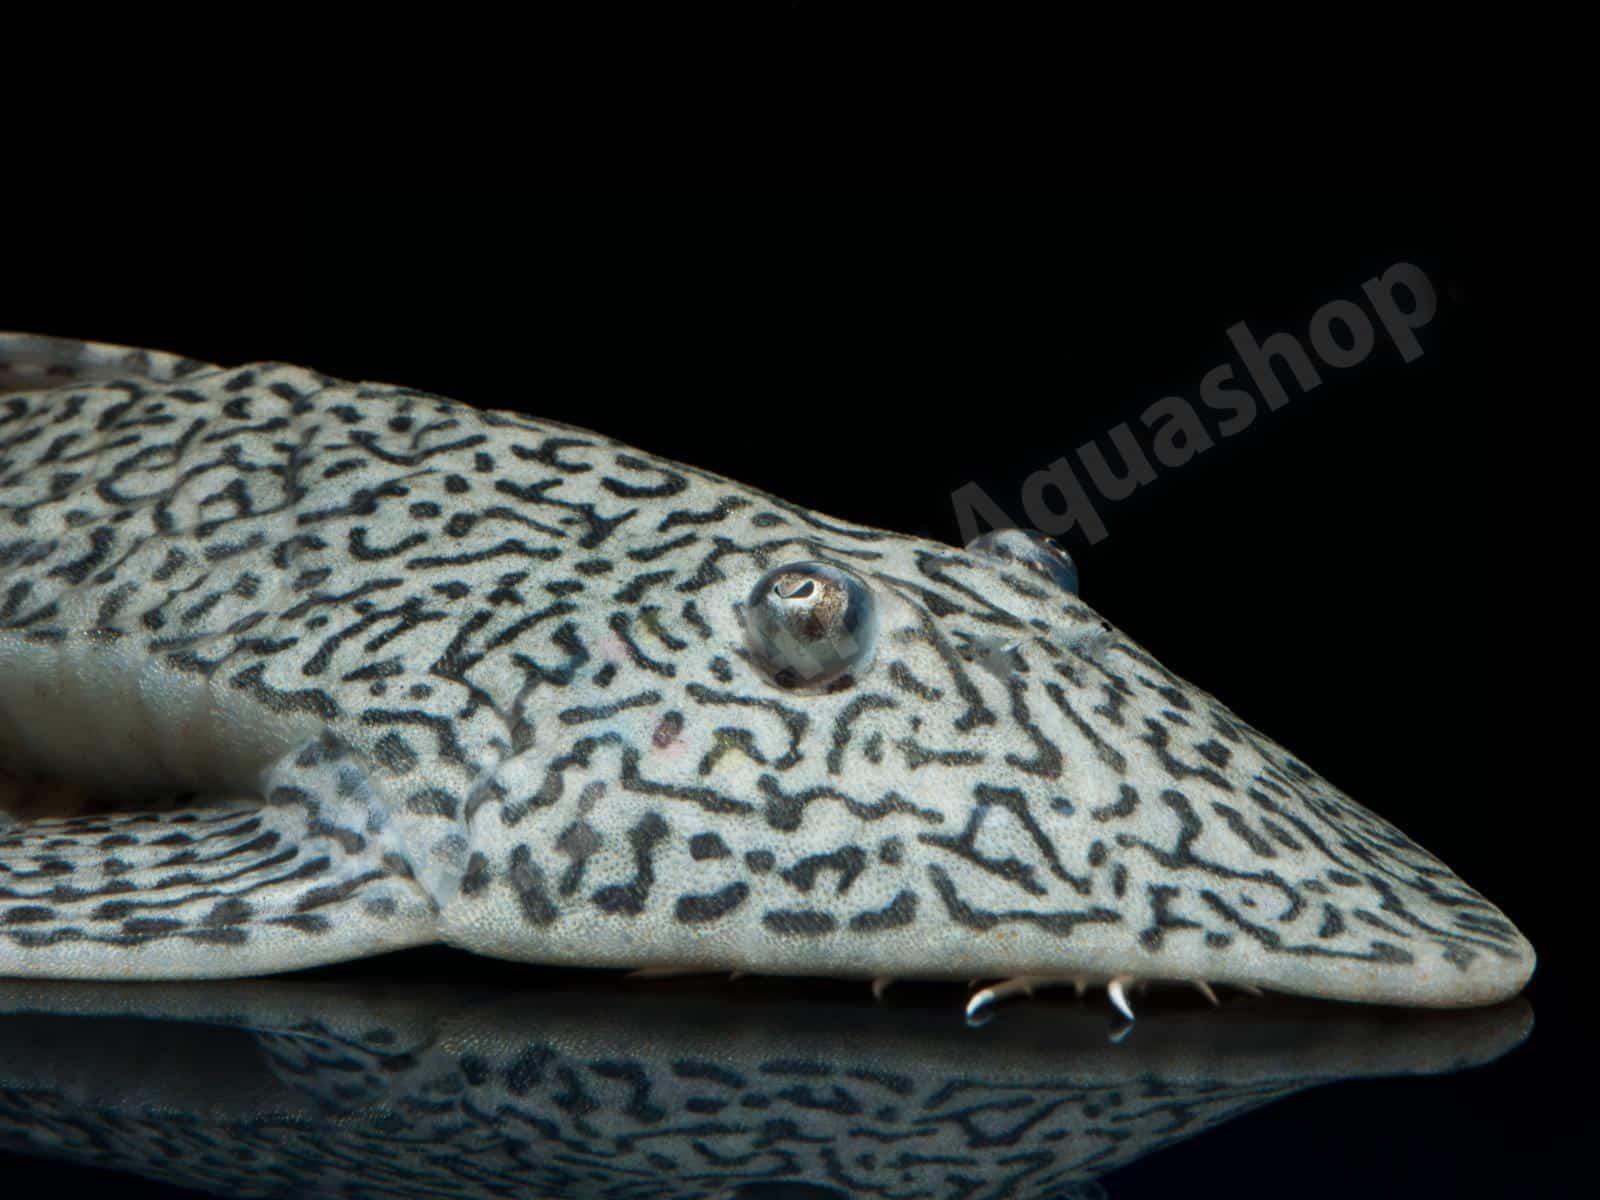 pseudohemiodon apithanos enrico richter 0258 9